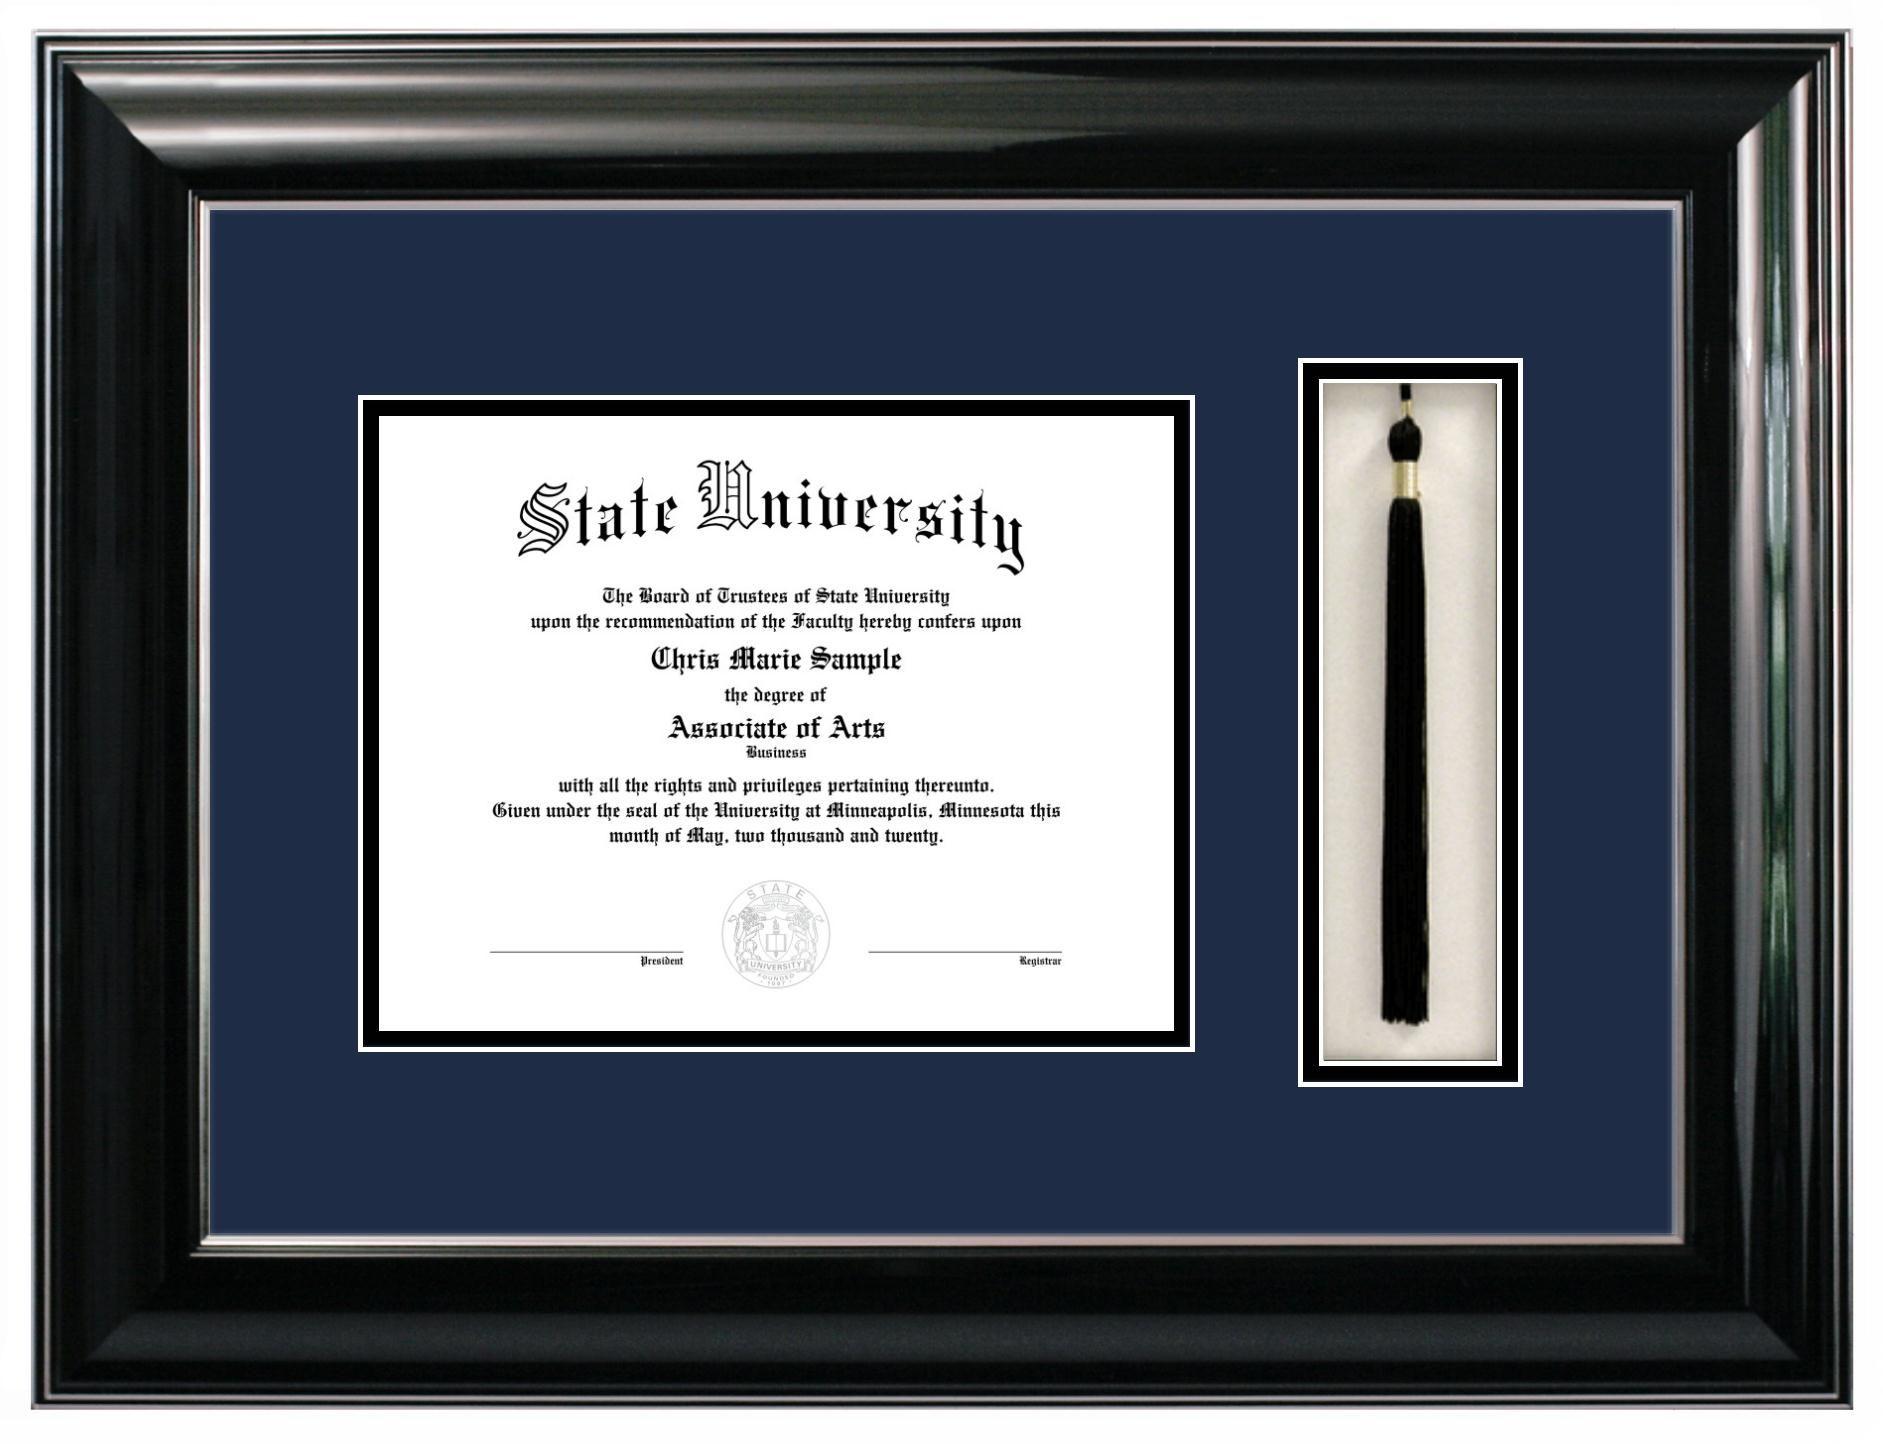 Classic Diploma Frame - Tassel -- dang diploma frames are expensive ...